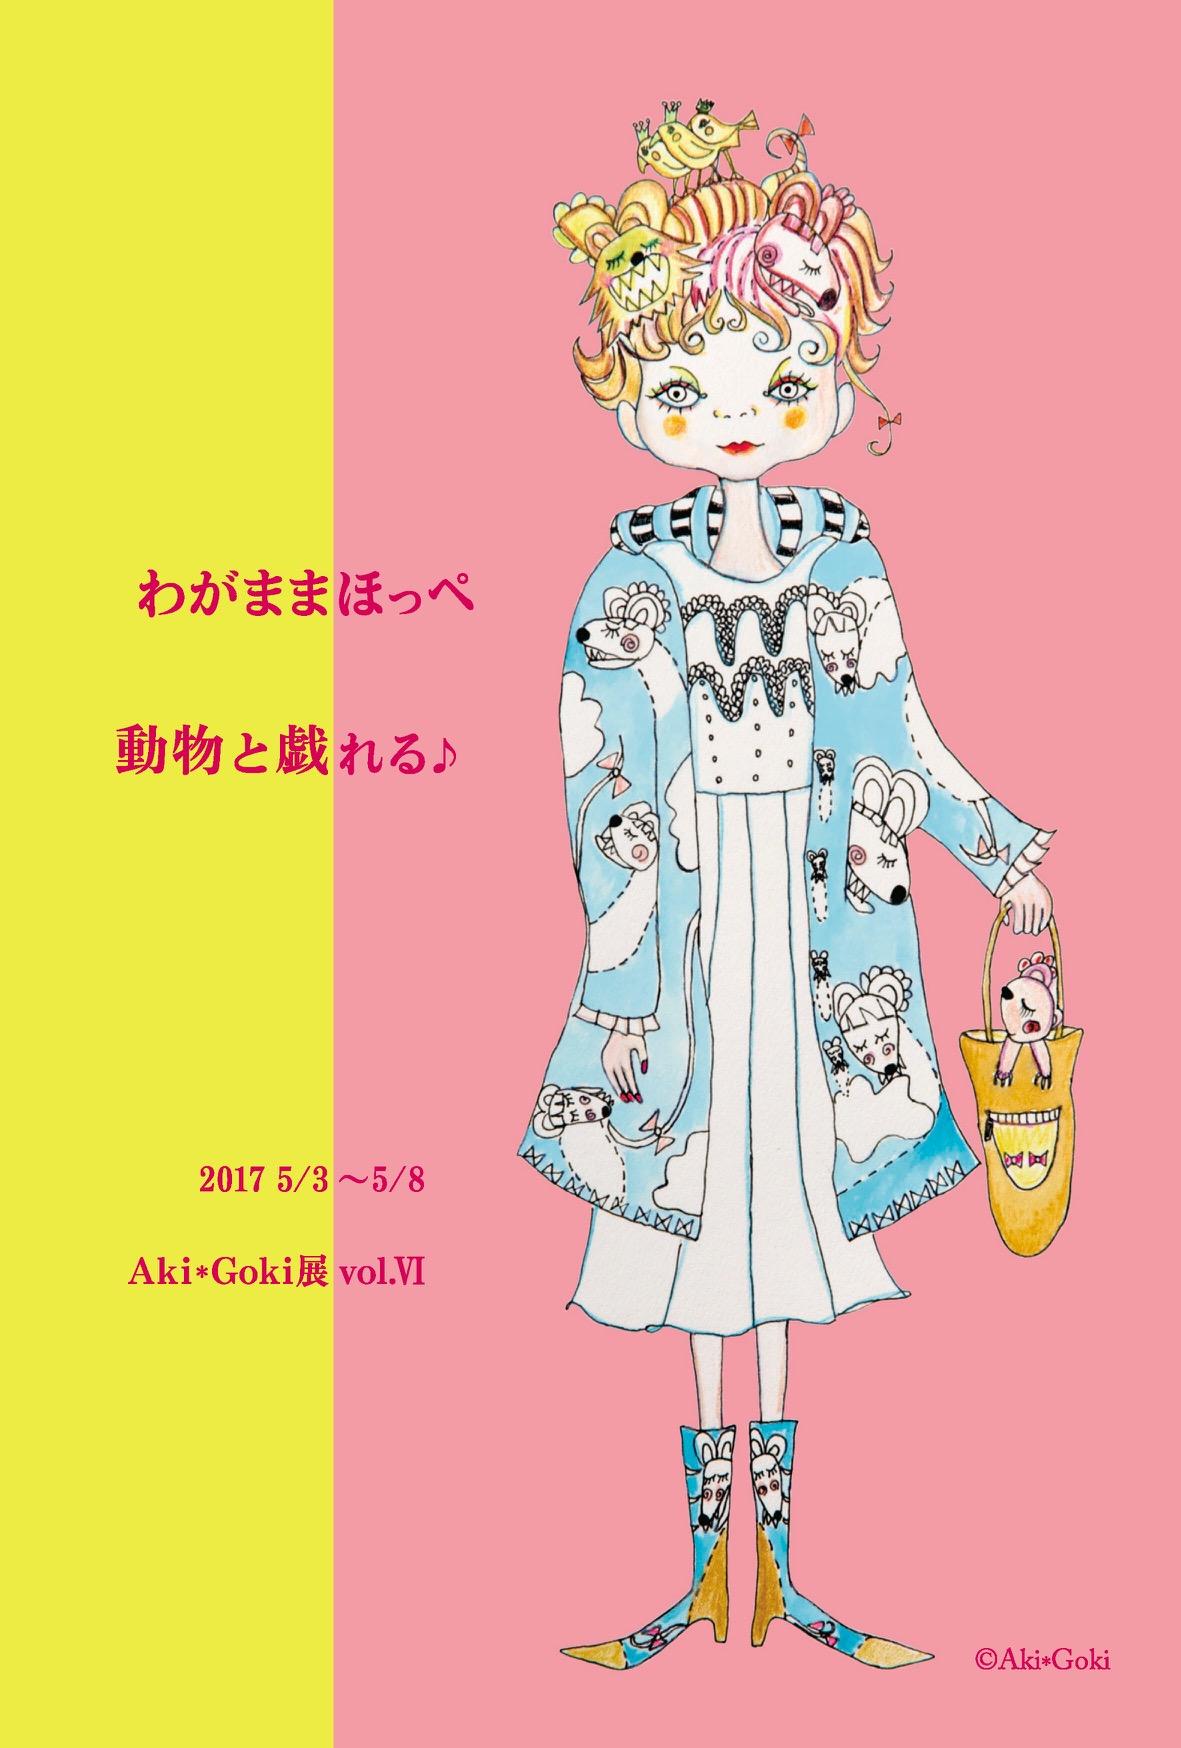 Aki*Goki展 vol.Ⅵ わがままほっぺ動物と戯れる 2017 5/3(⽔)〜5/8(⽉)